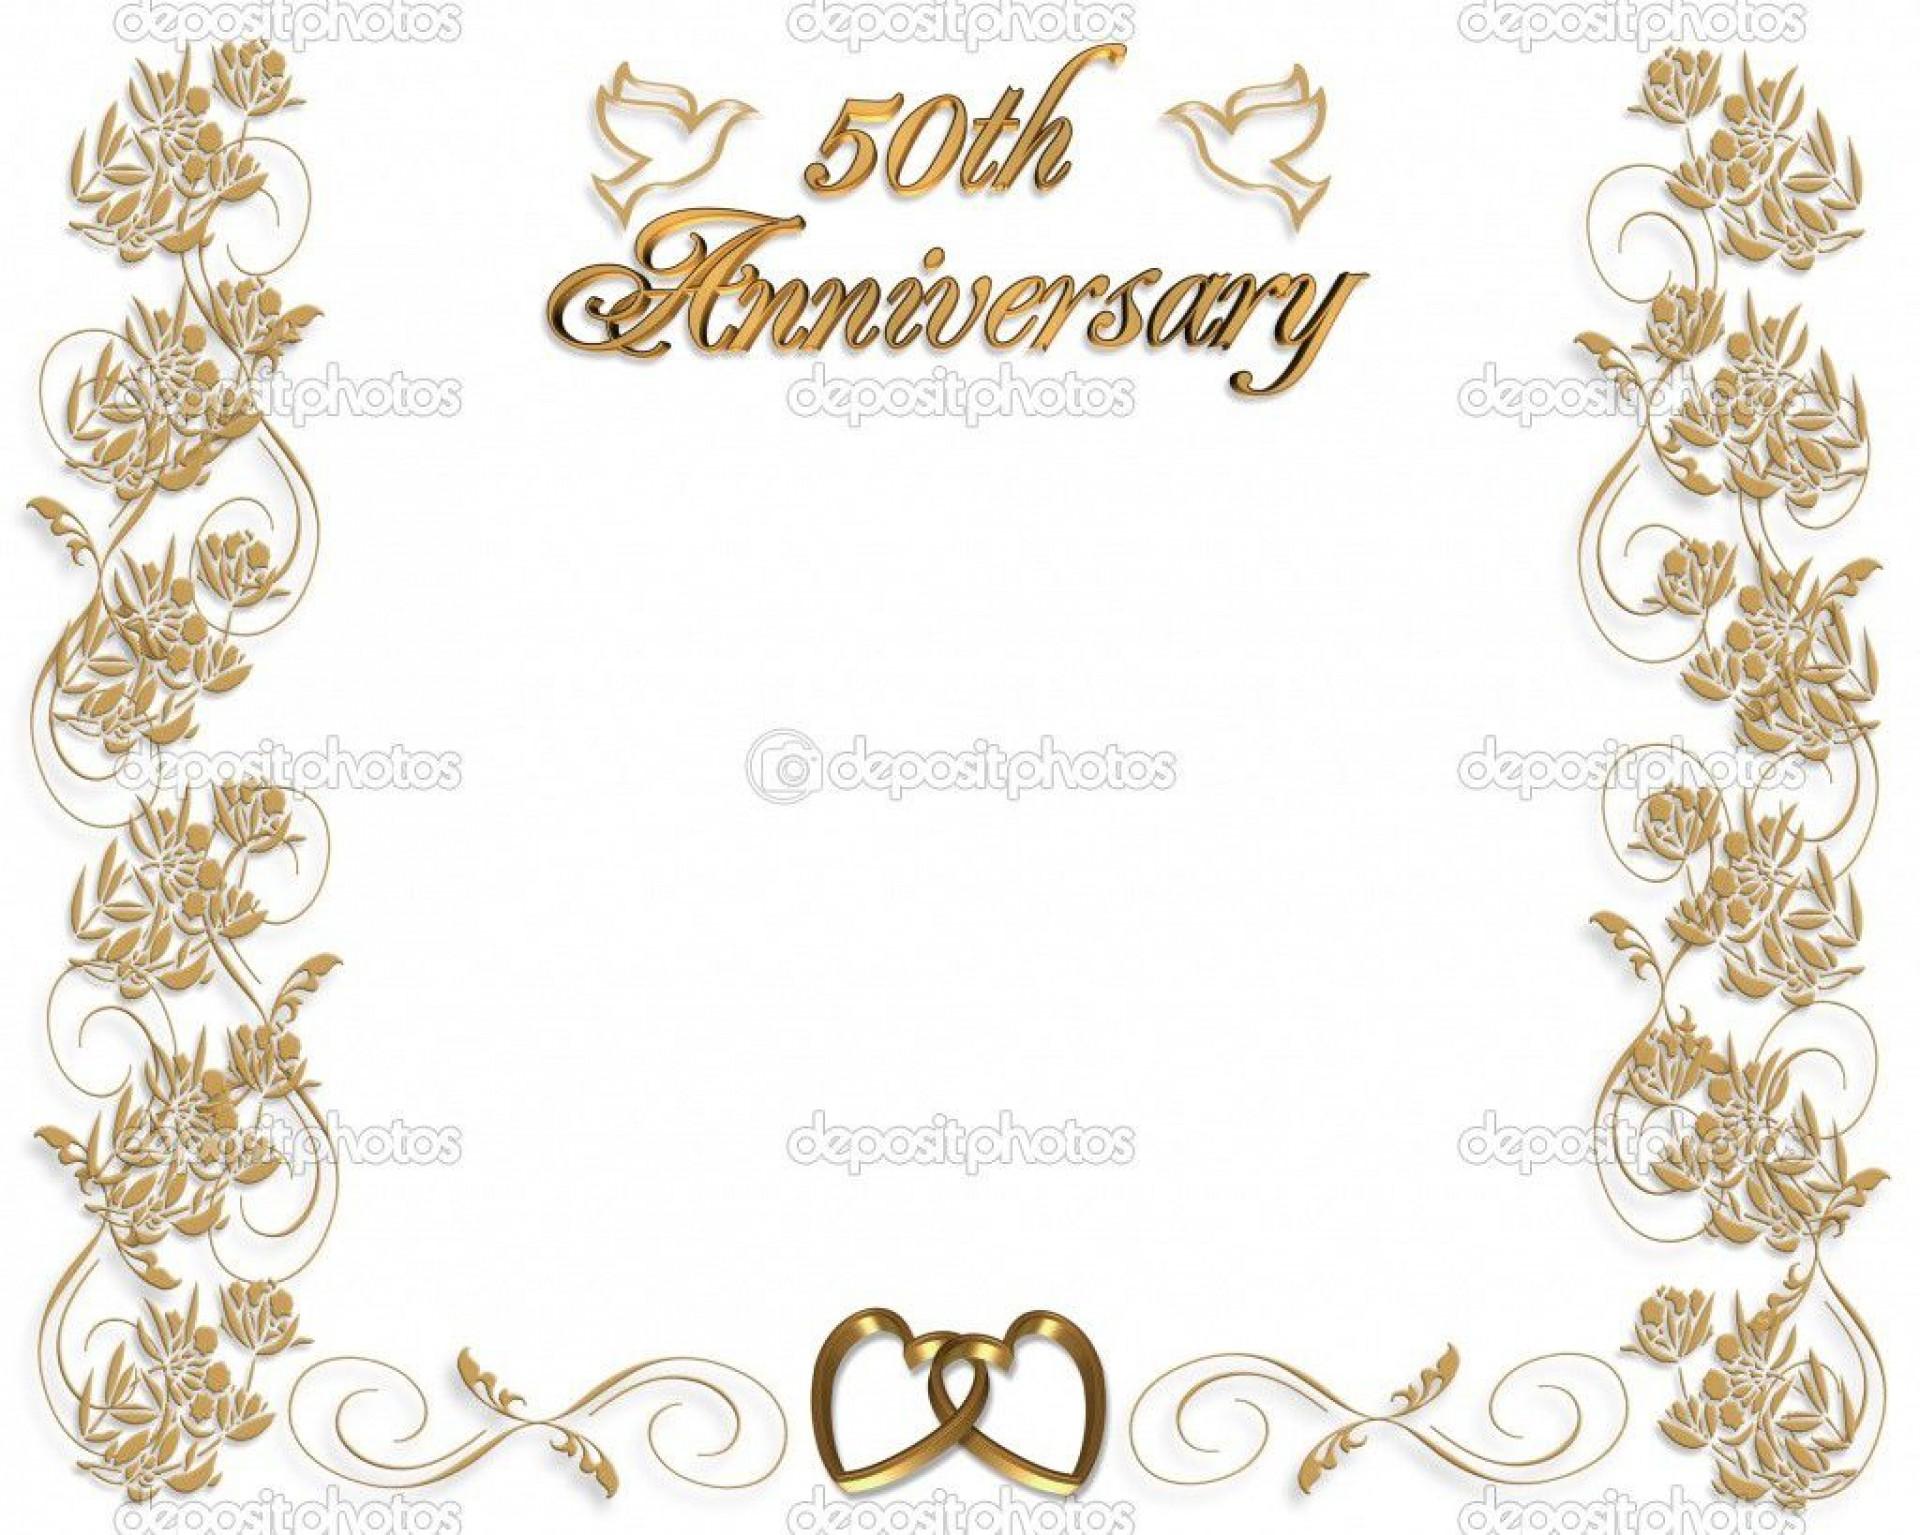 005 Fantastic Free Printable 50th Wedding Anniversary Invitation Template Design 1920